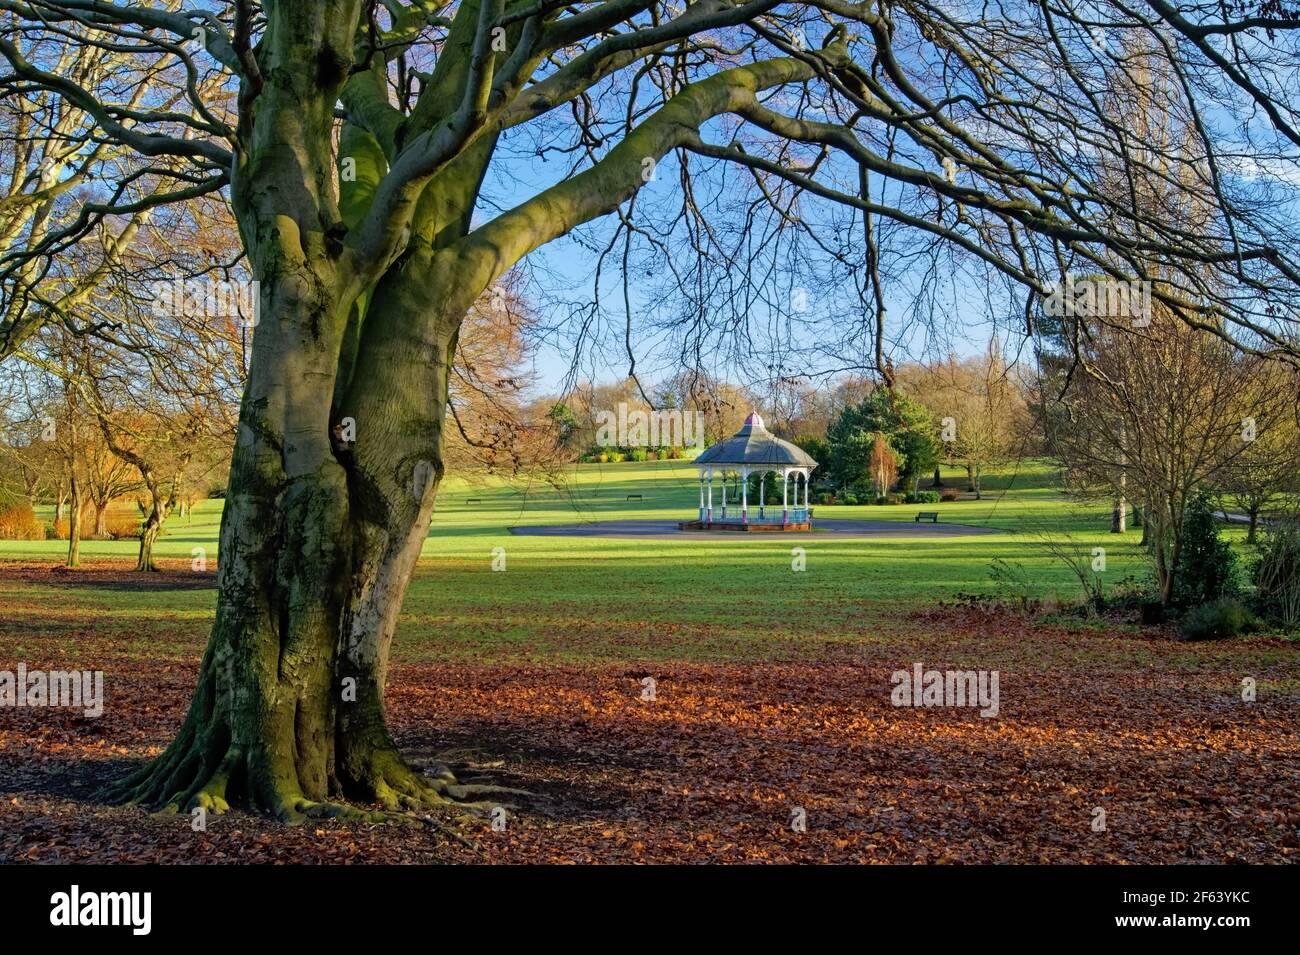 Reino Unido, South Yorkshire, Barnsley, Locke Park Bandstand Foto de stock